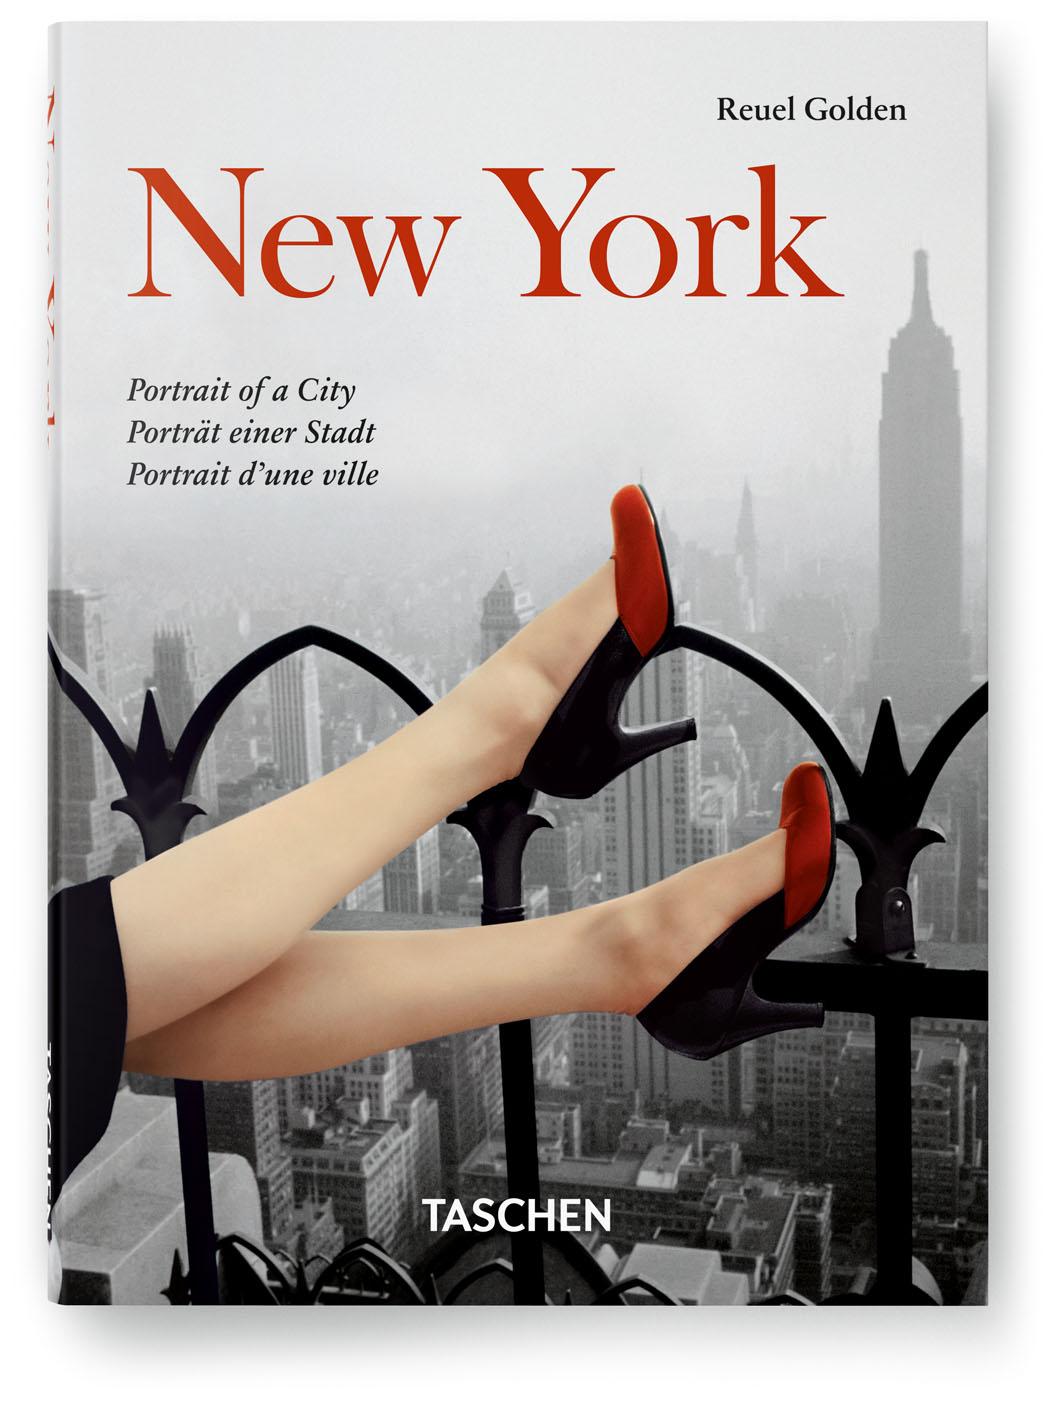 """New York - Portrait of a City"", Reuel Golden, TASCHEN"